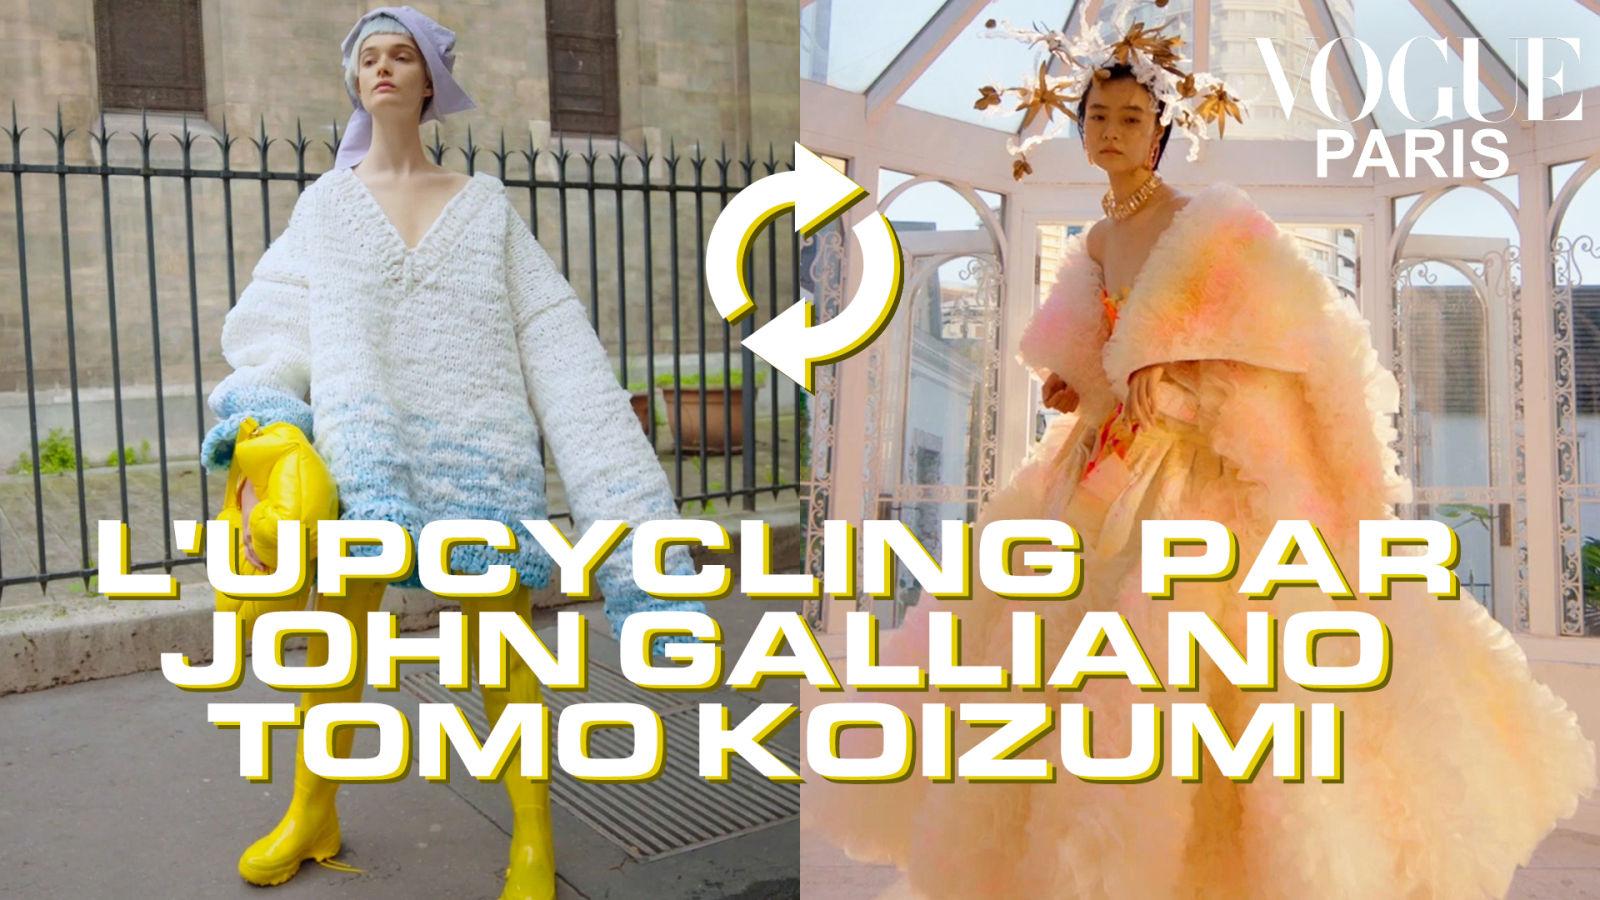 Leçon d'upcycling avec John Galliano et Tomo Koizumi